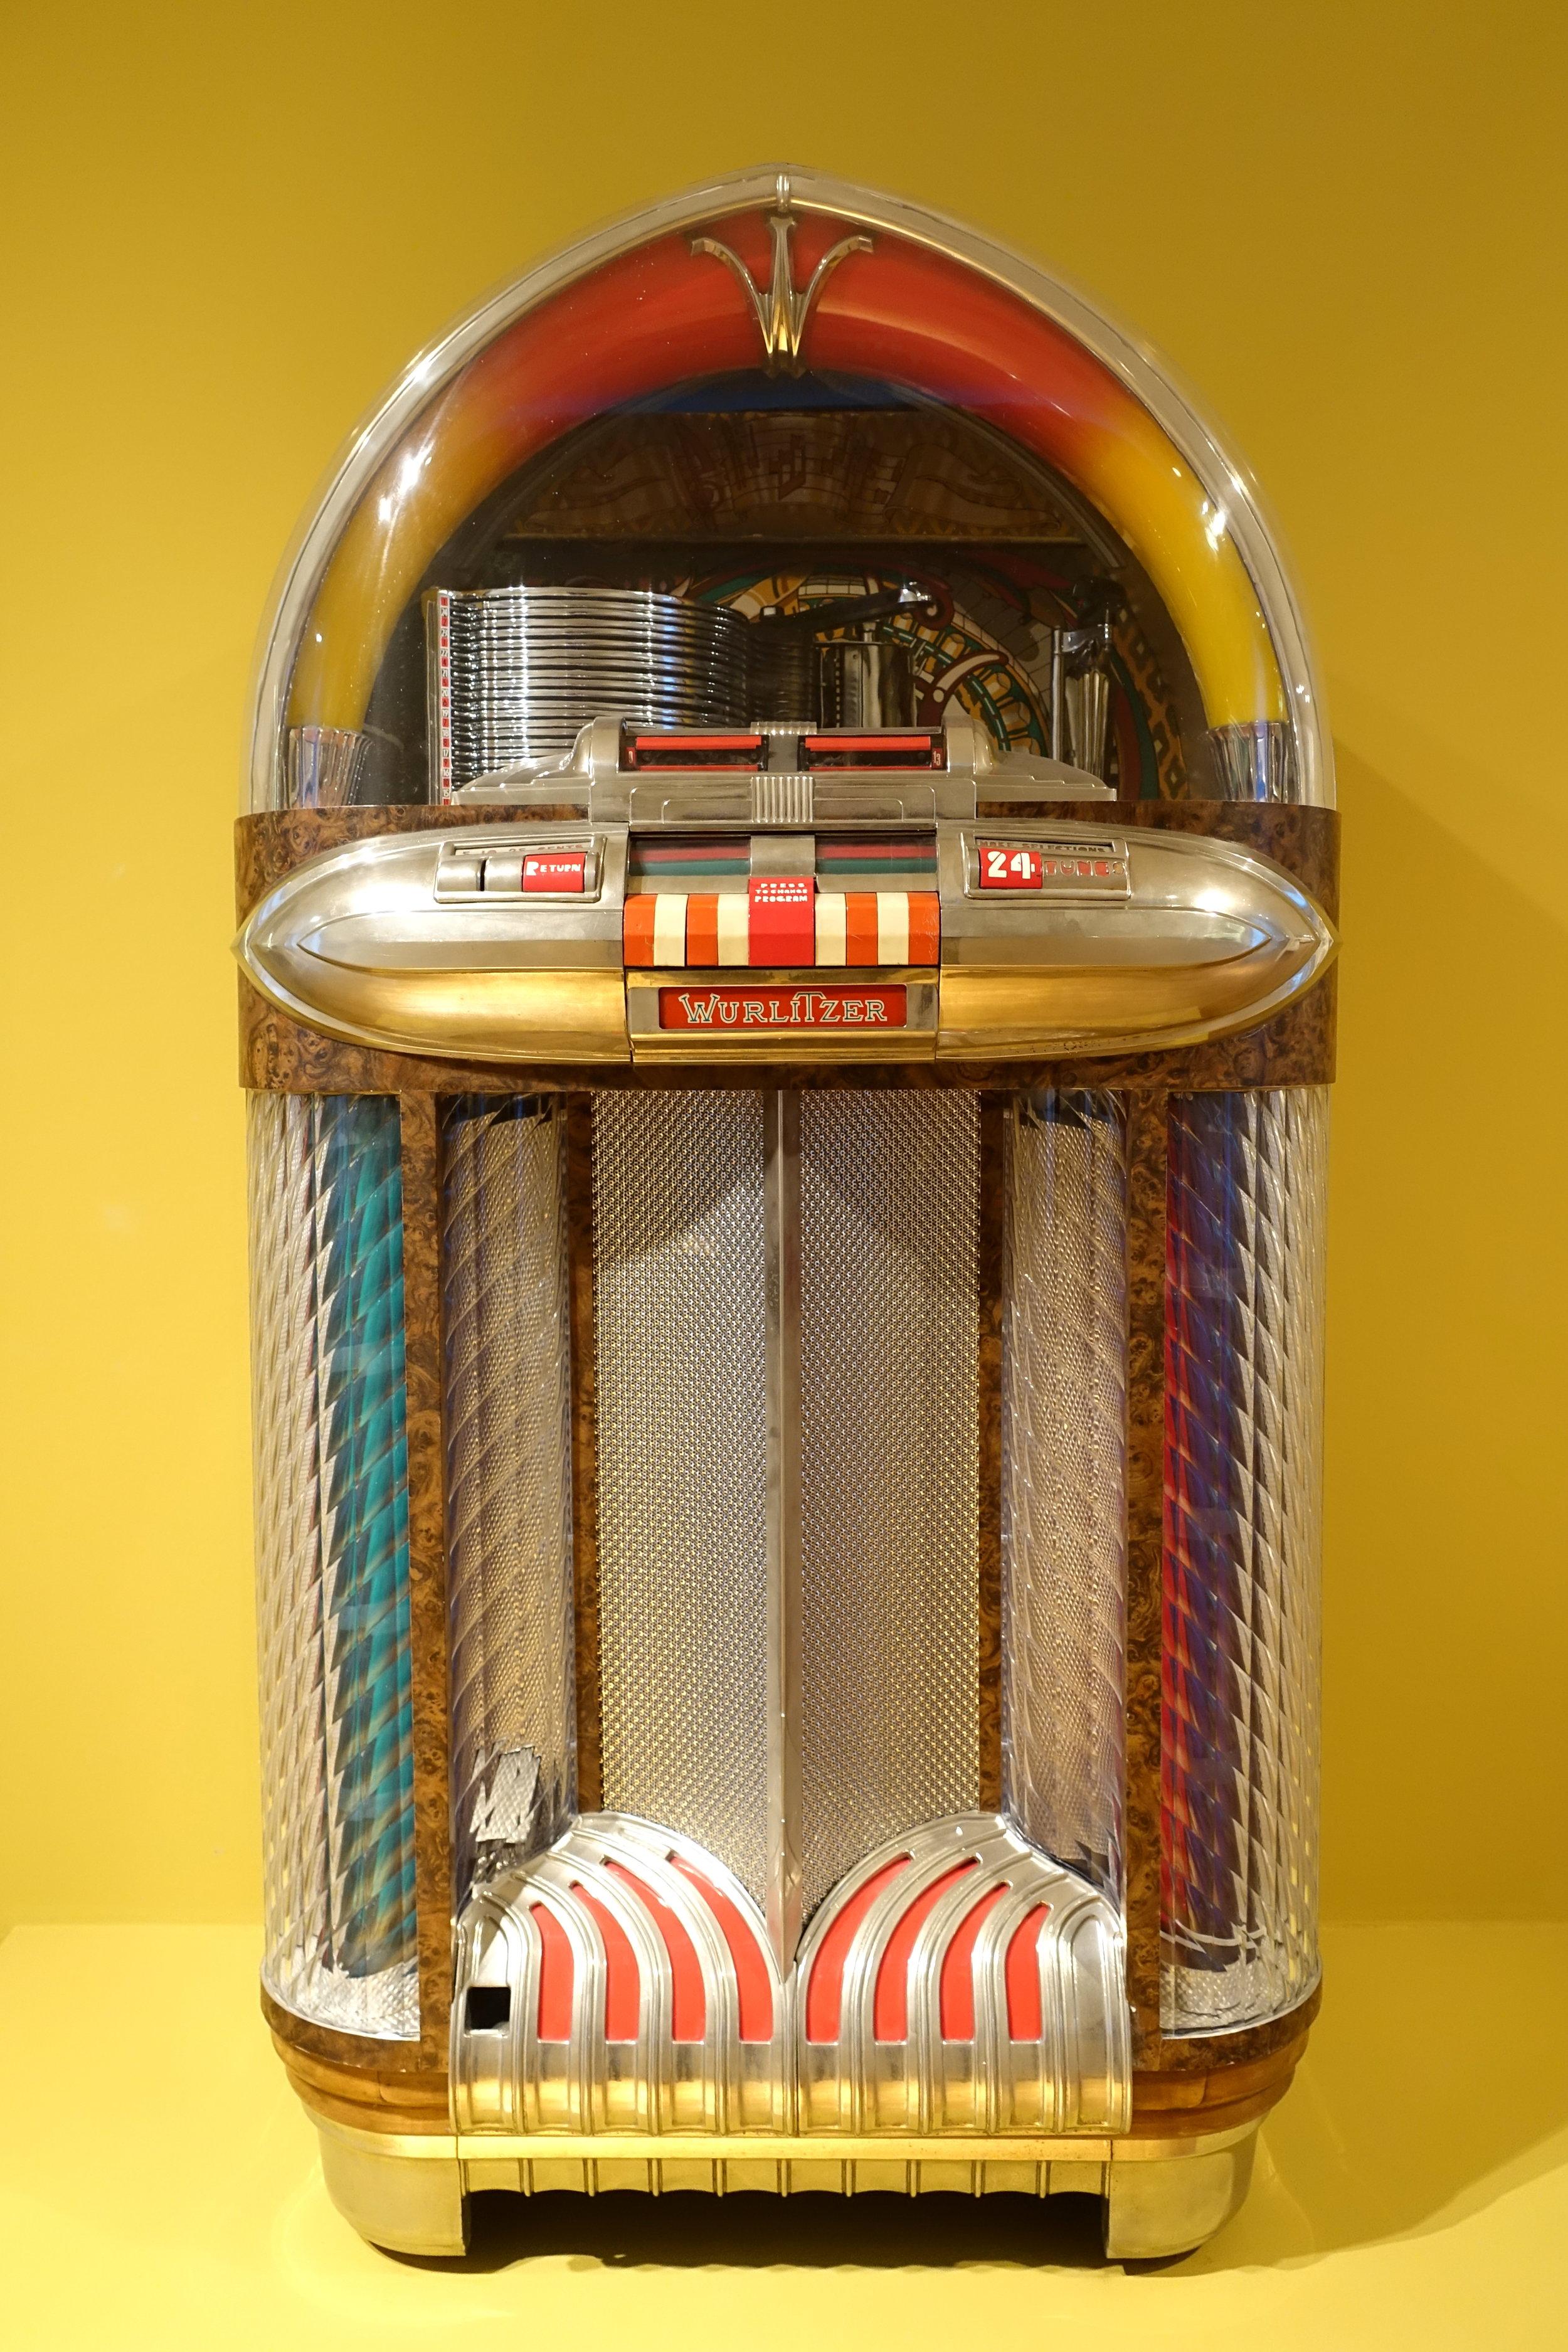 Wurlitzer_1100_jukebox,_designed_by_Paul_Fuller,_1948,_metal,_glass,_wood,_plastic_-_Museum_für_Angewandte_Kunst_Köln_-_Cologne,_Germany_-_DSC09472.jpg